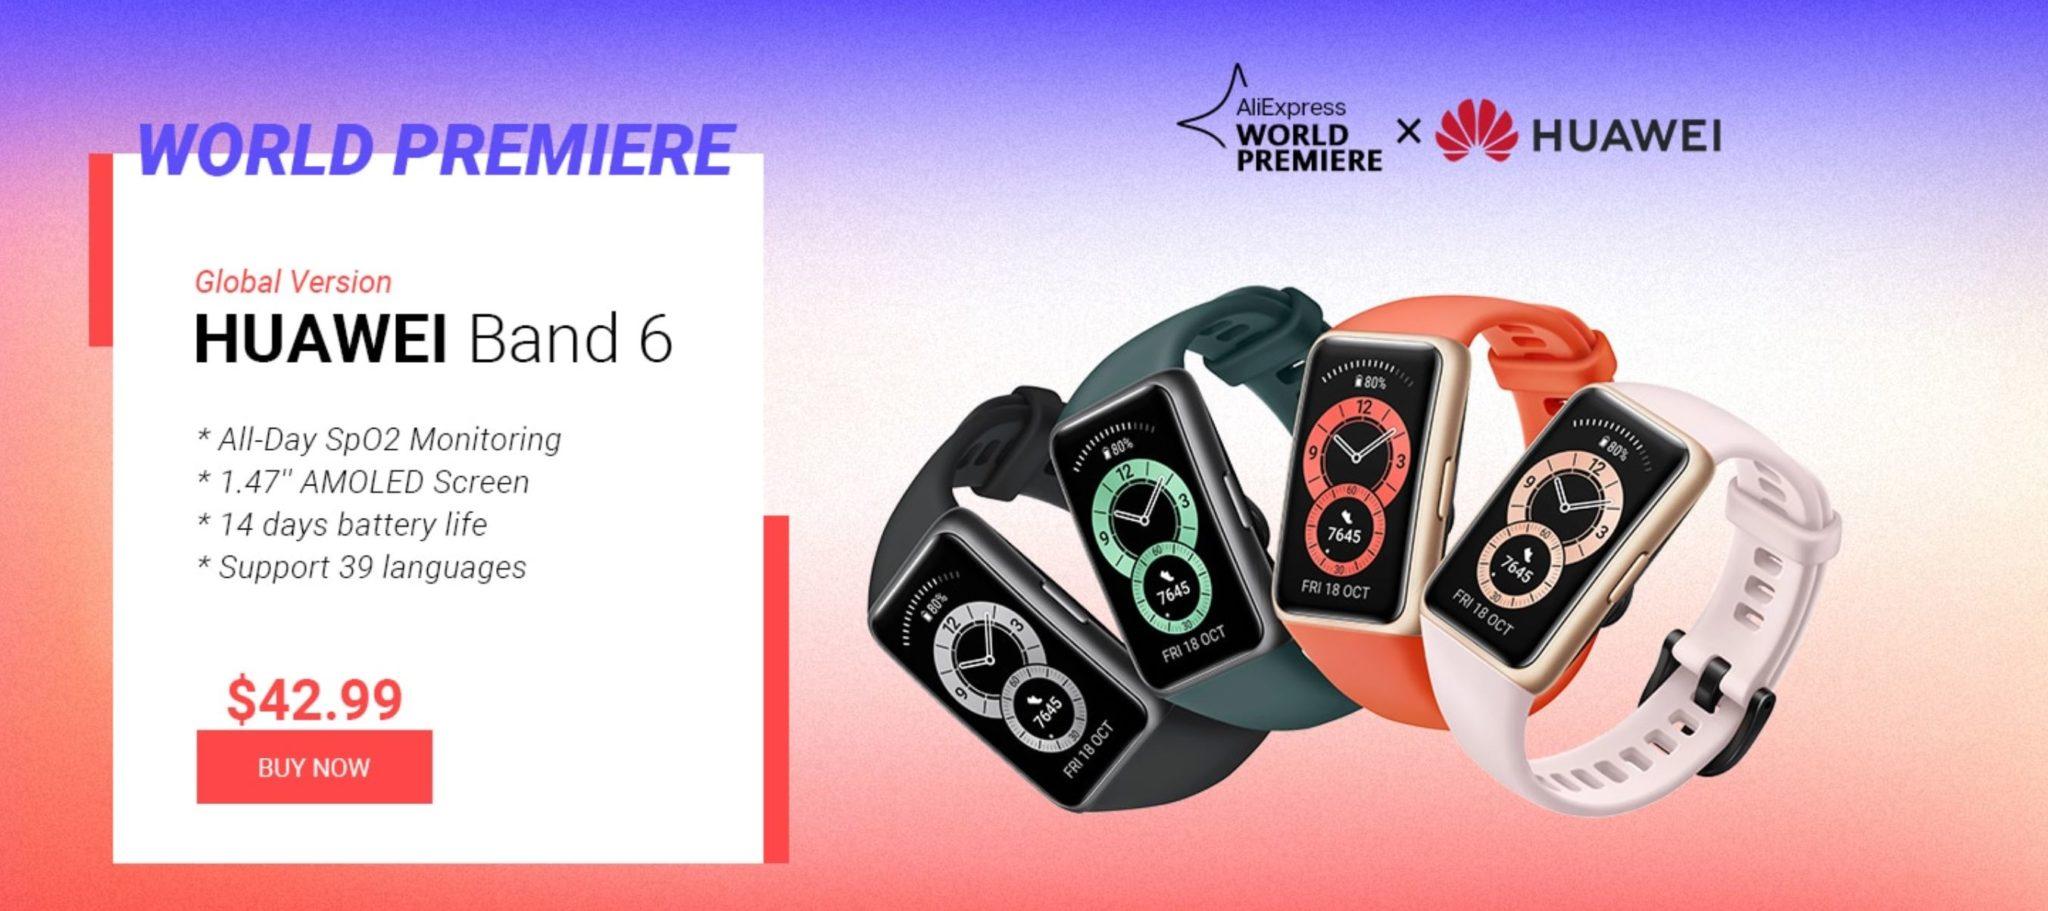 promocja Huawei Band 6 na Aliexpress